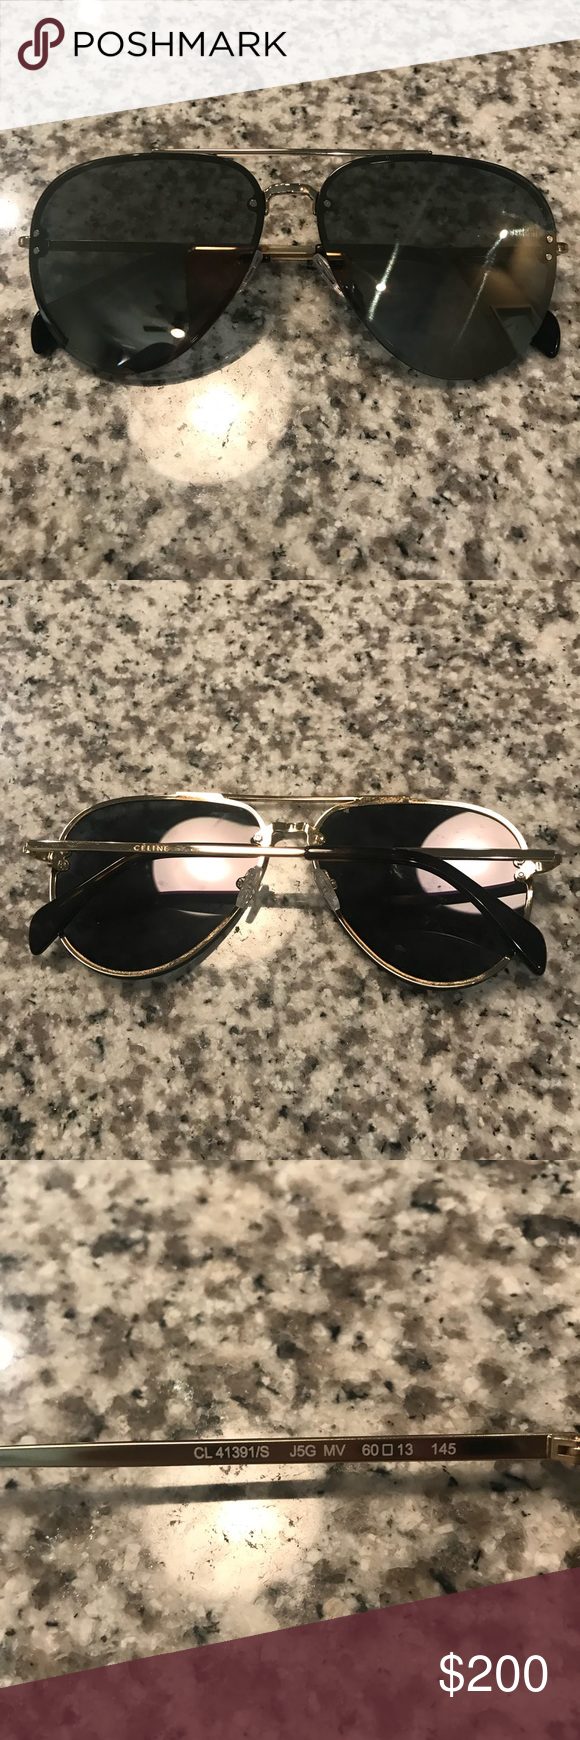 32a3e7cc3fbca Celine CL41391 S Gray Mirror Aviator Sunglasses NWT Never Worn- Celine CL  41391 S J5GSS Gold- Gold Flash Mirrored Lens Gold Frame Aviator Sunglasses  60mm ...